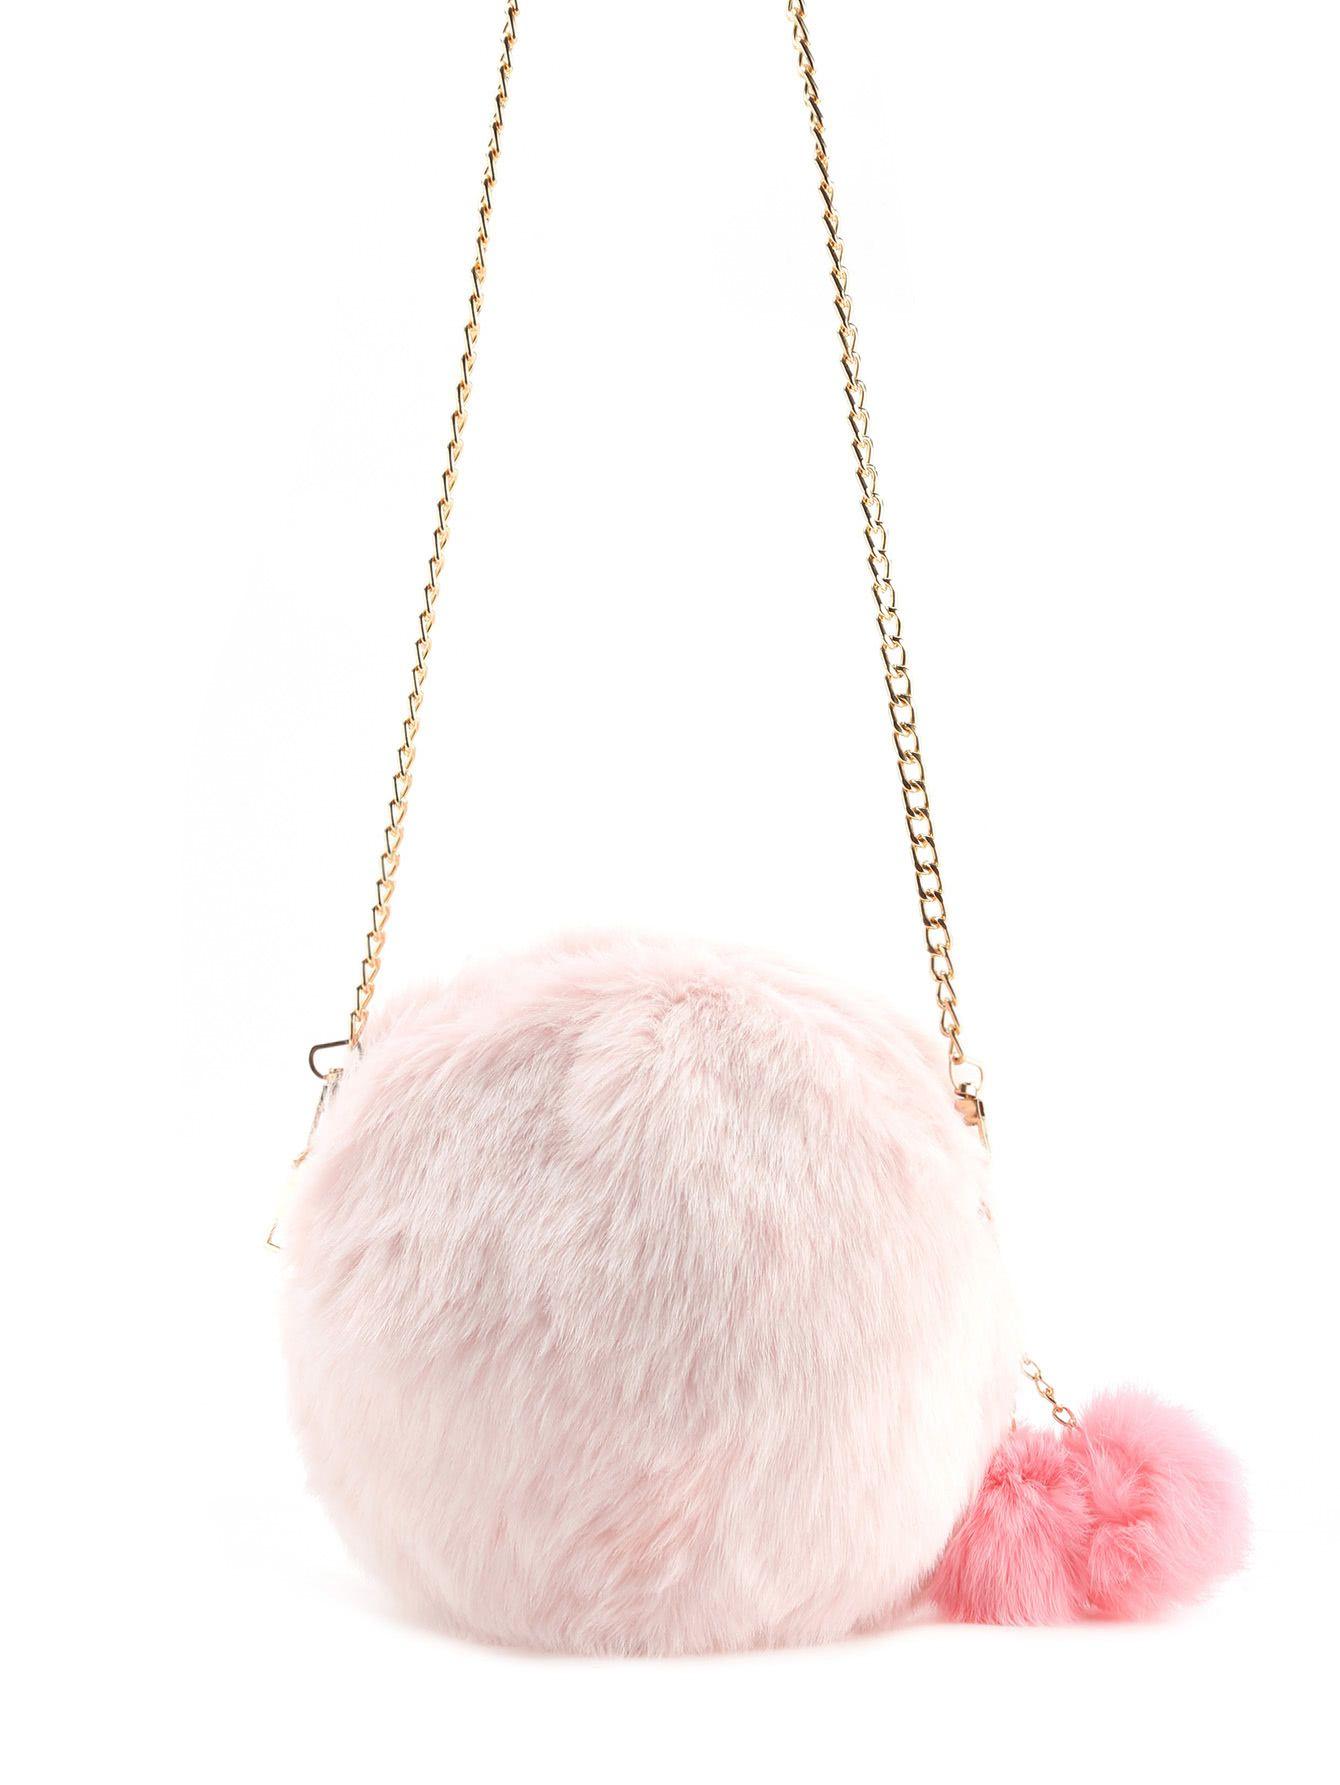 d26ed37163c4 Faux Fur Overlay Crossbody Bag With Pom PomFor Women-romwe